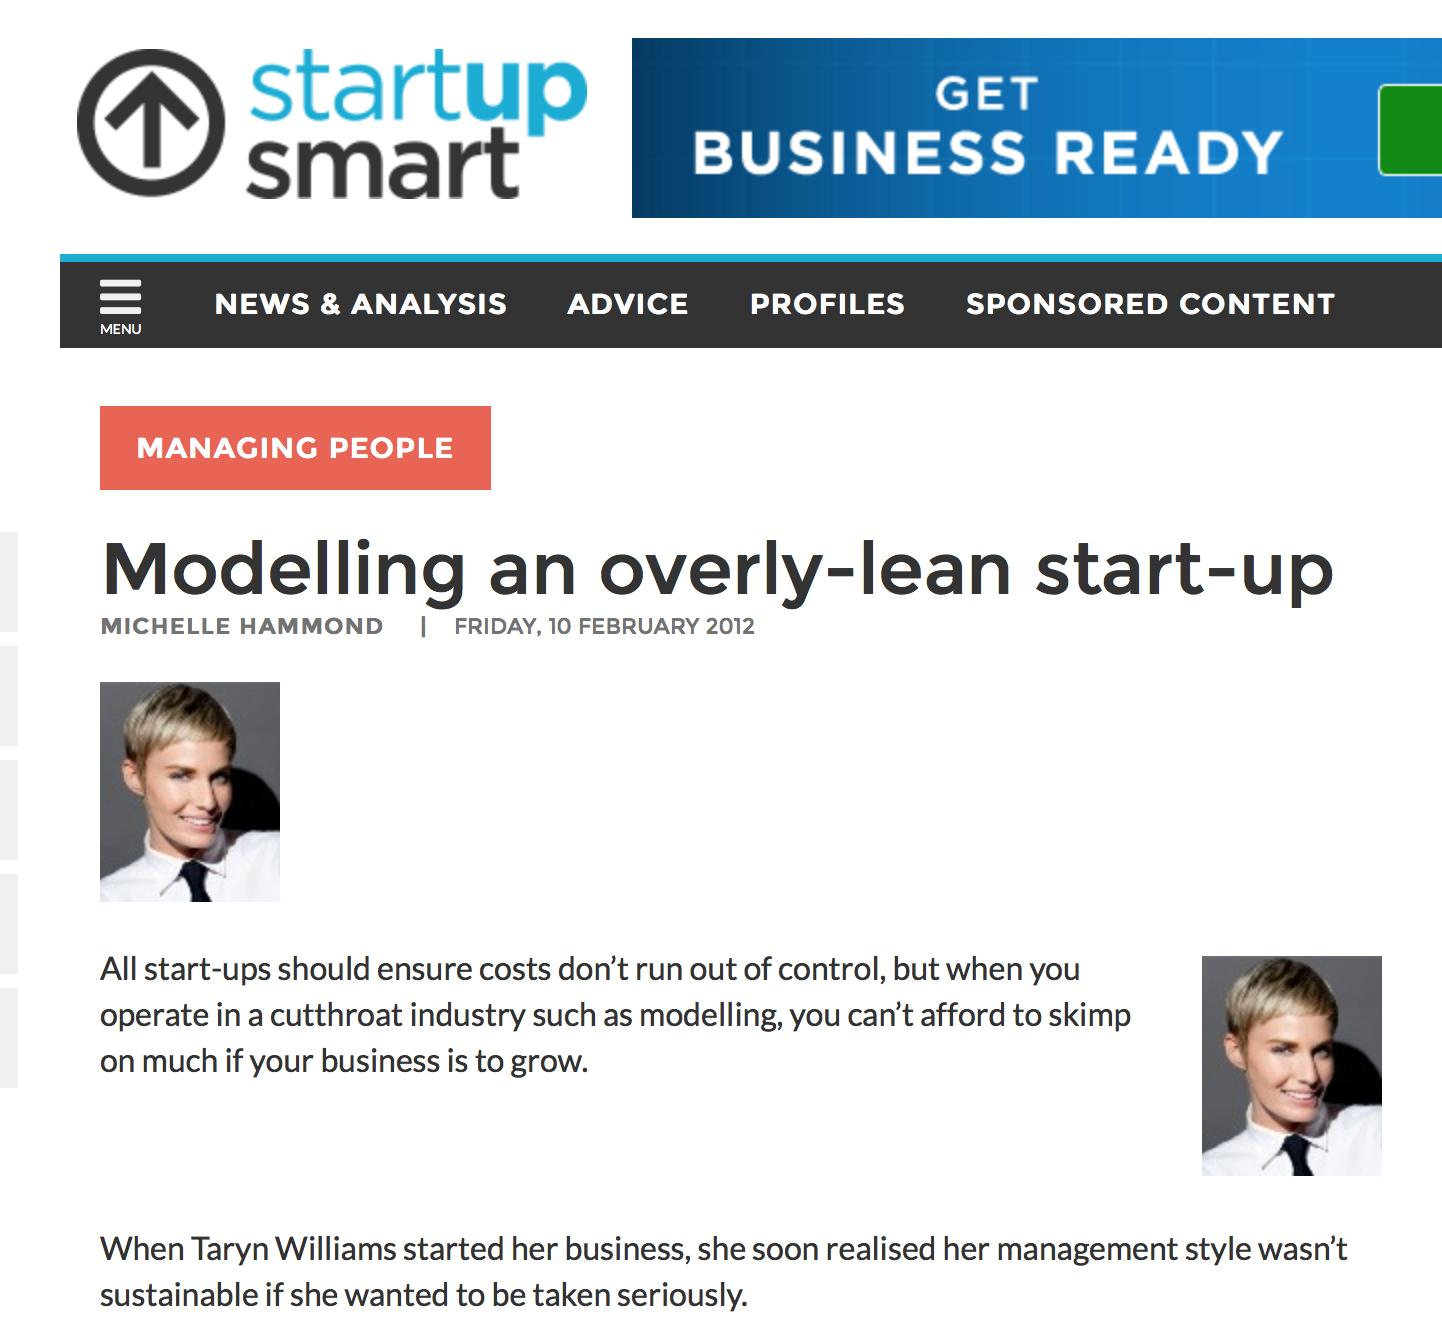 http://www.startupsmart.com.au/advice/finance/modelling-an-overly-lean-start-up/